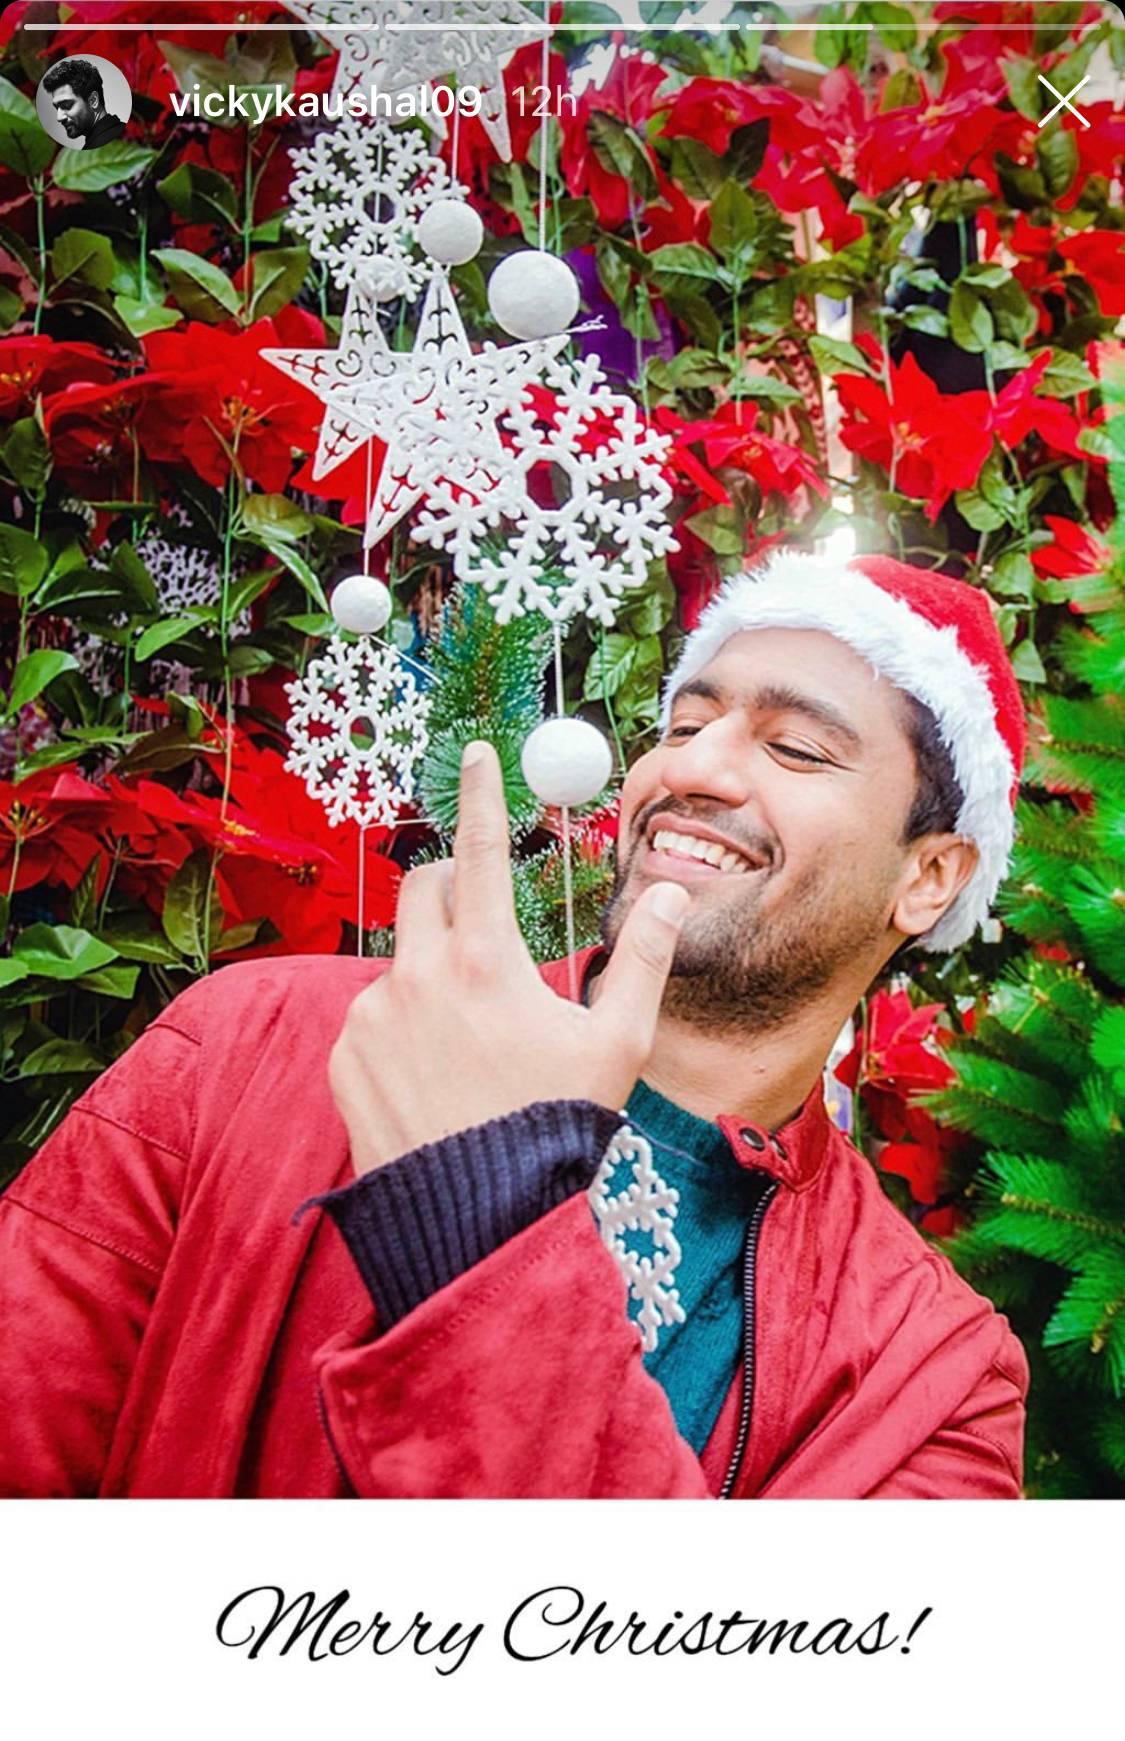 Vicky Kaushal wished all a Merry Christmas